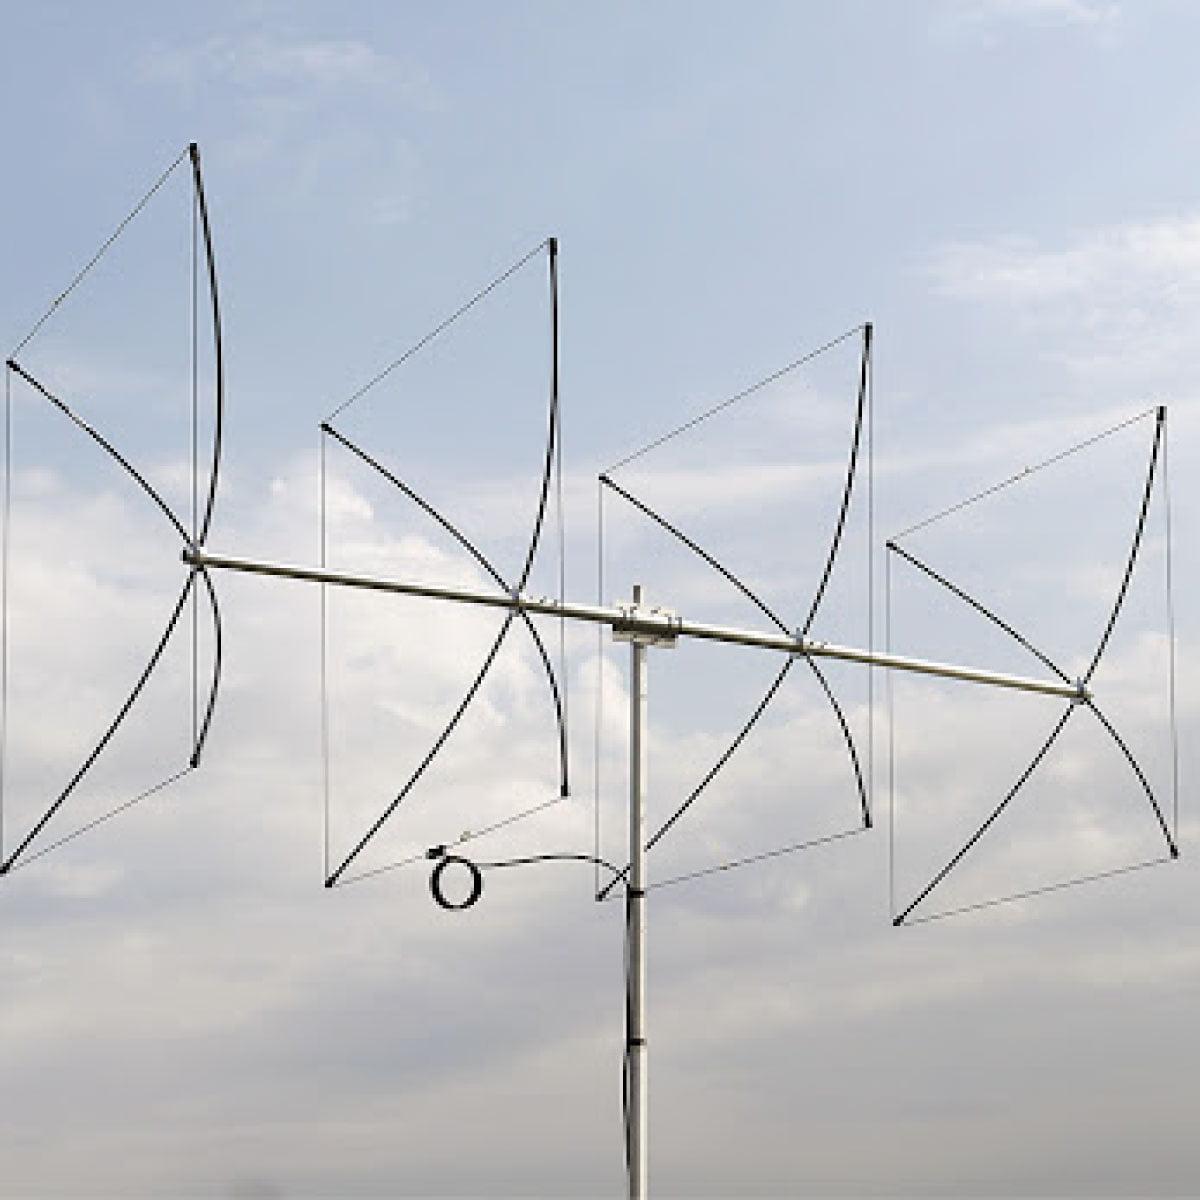 Monopole Antenna for Quad Band